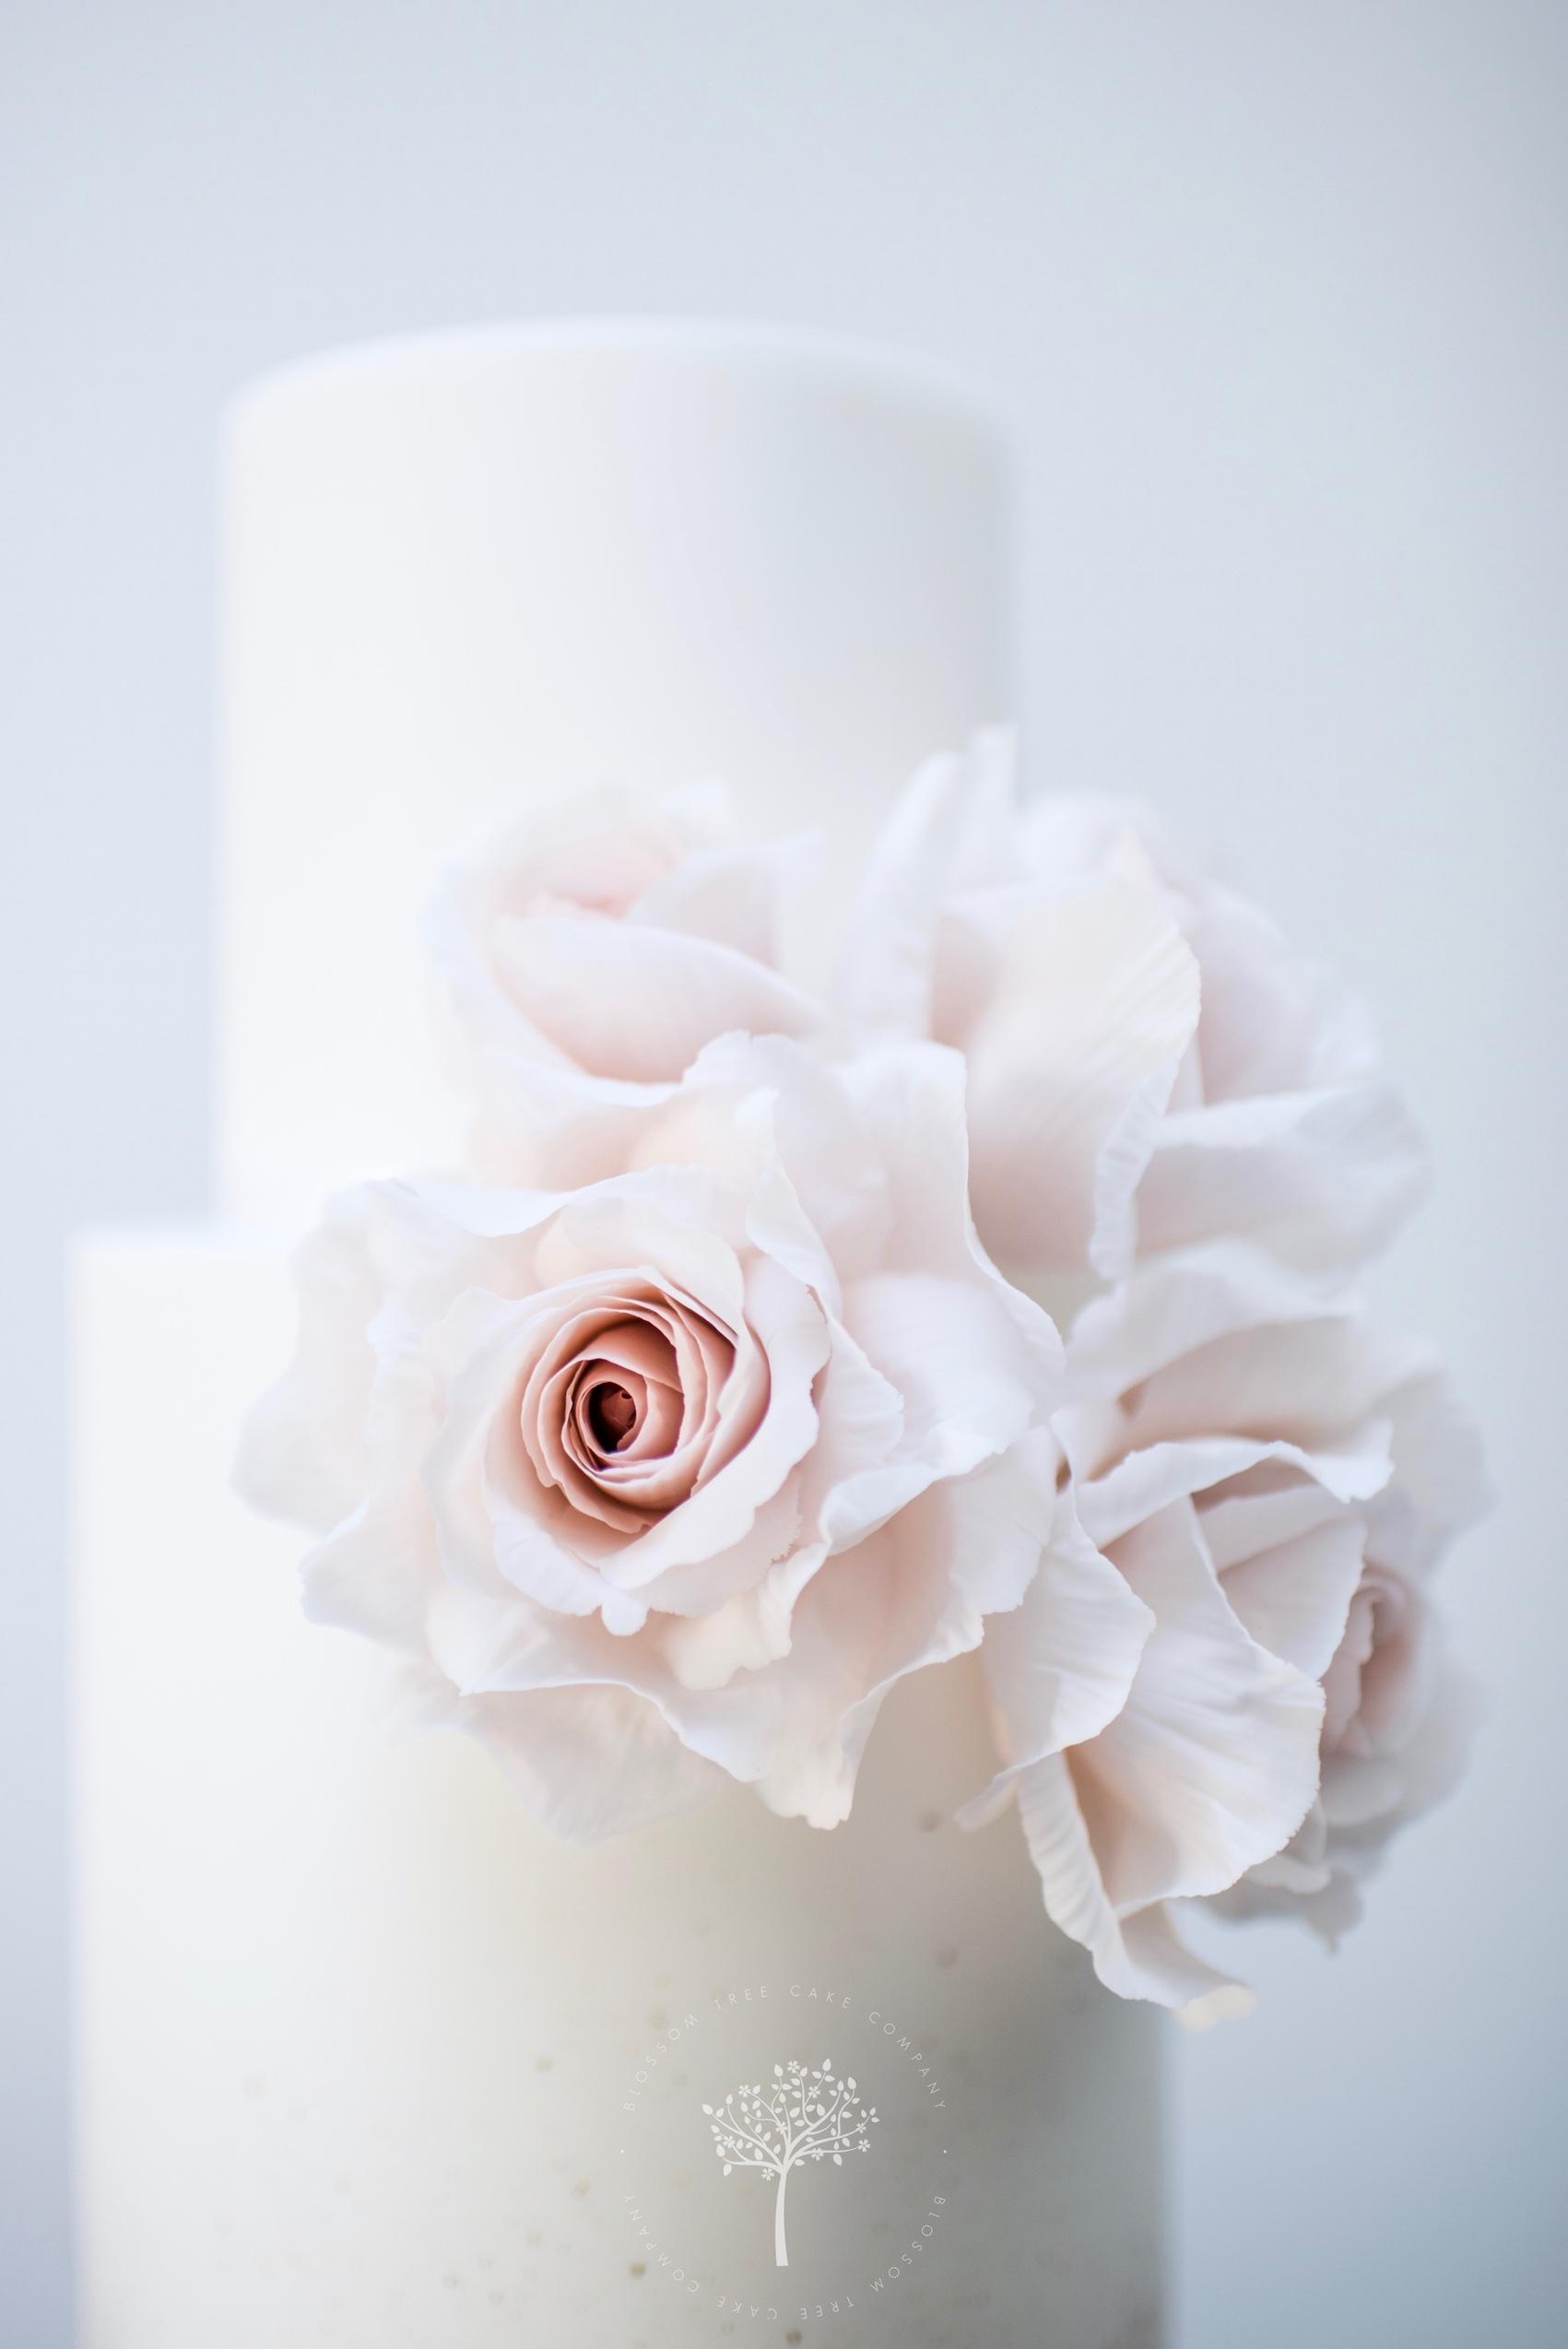 Origami Rose wedding cake by Blossom Tree Cake Company Harrogate North Yorkshire - top sugar roses.jpg